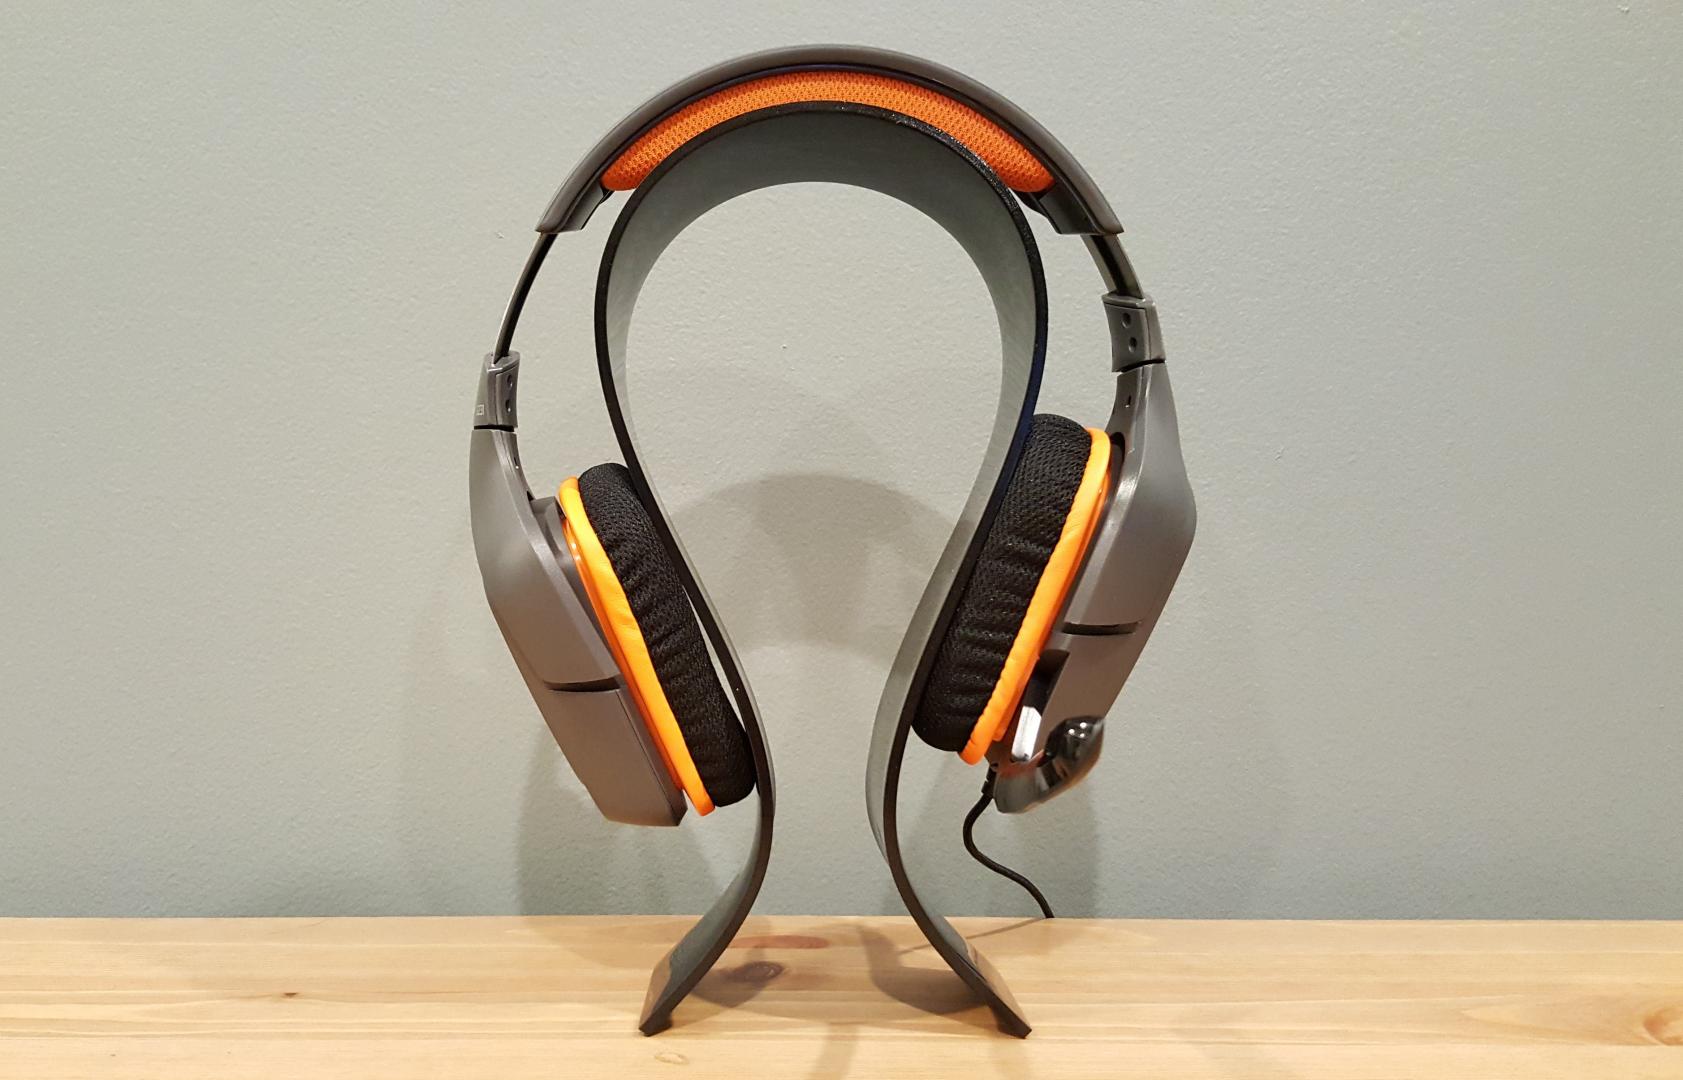 [Xbox One|PS4|PC] Logitech G231 Prodigy Gaming Headset